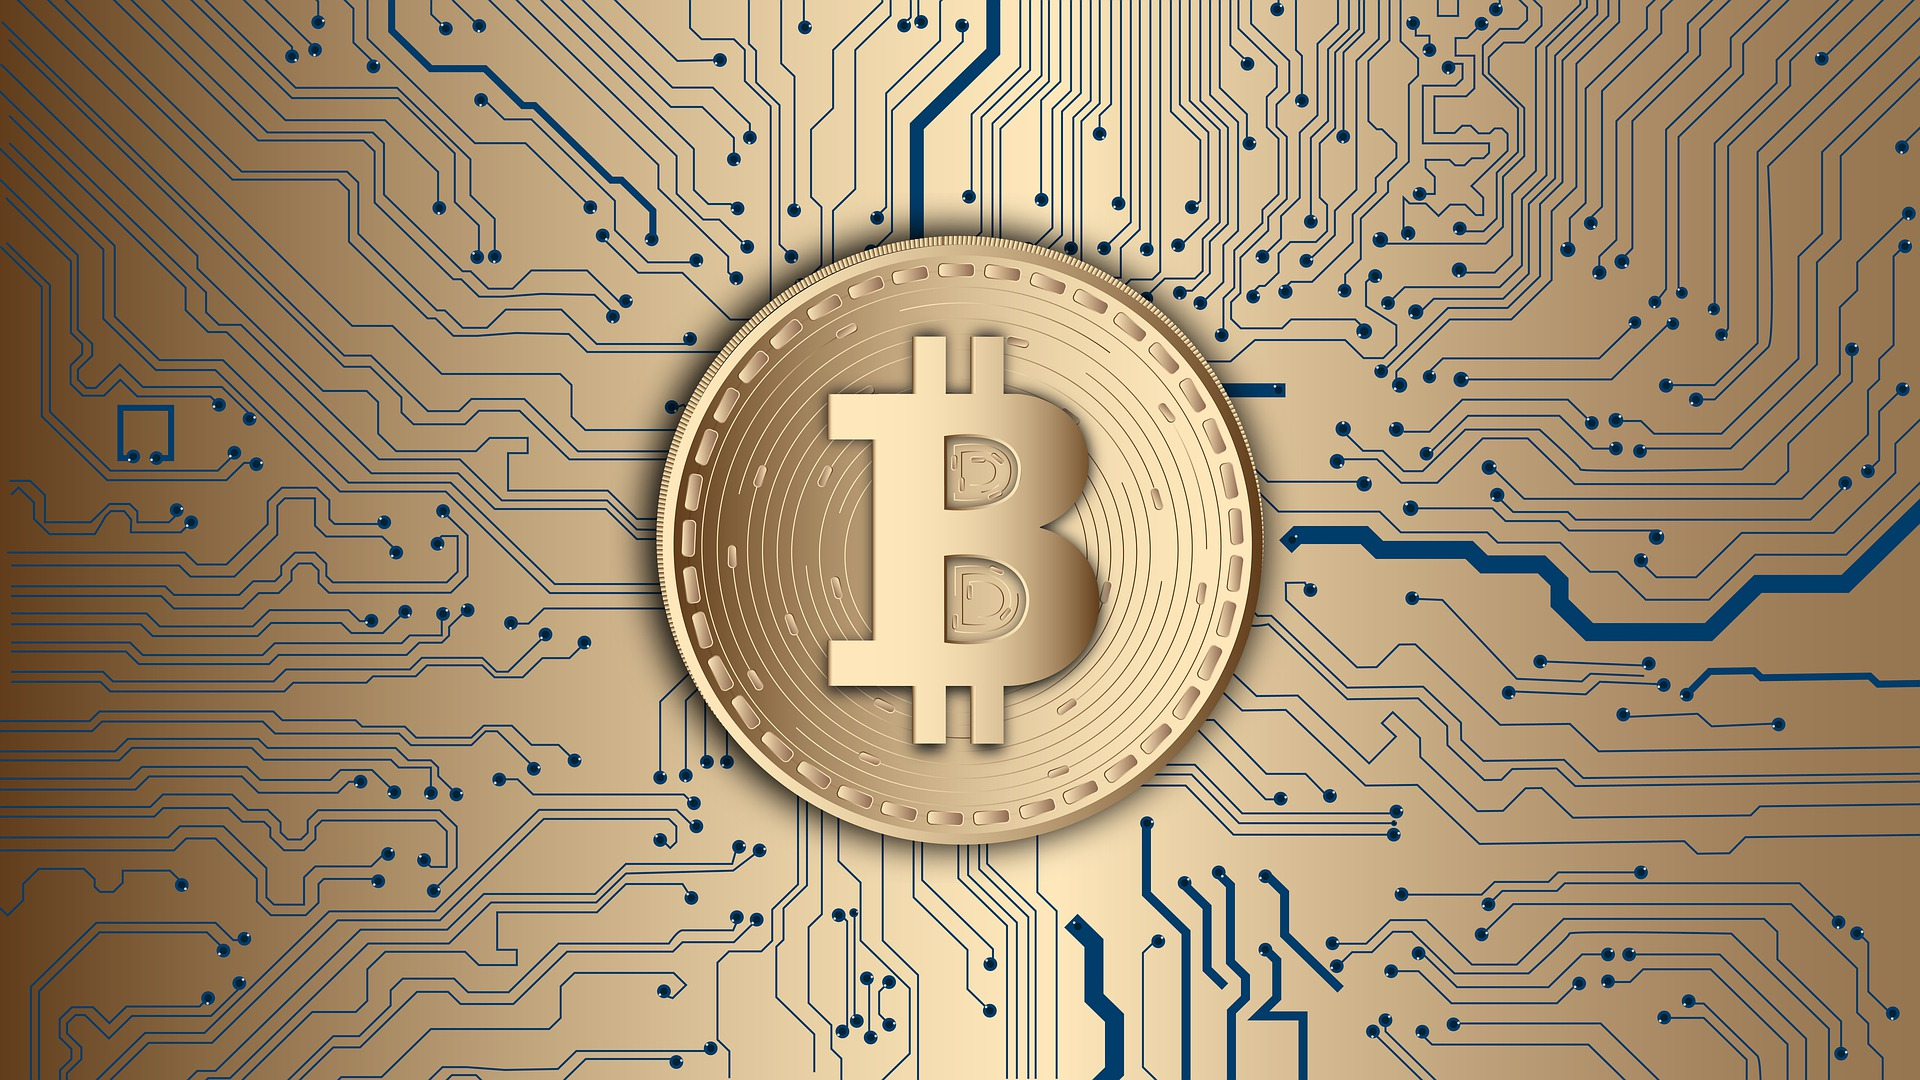 geld verdienen mit bitcoin di trading